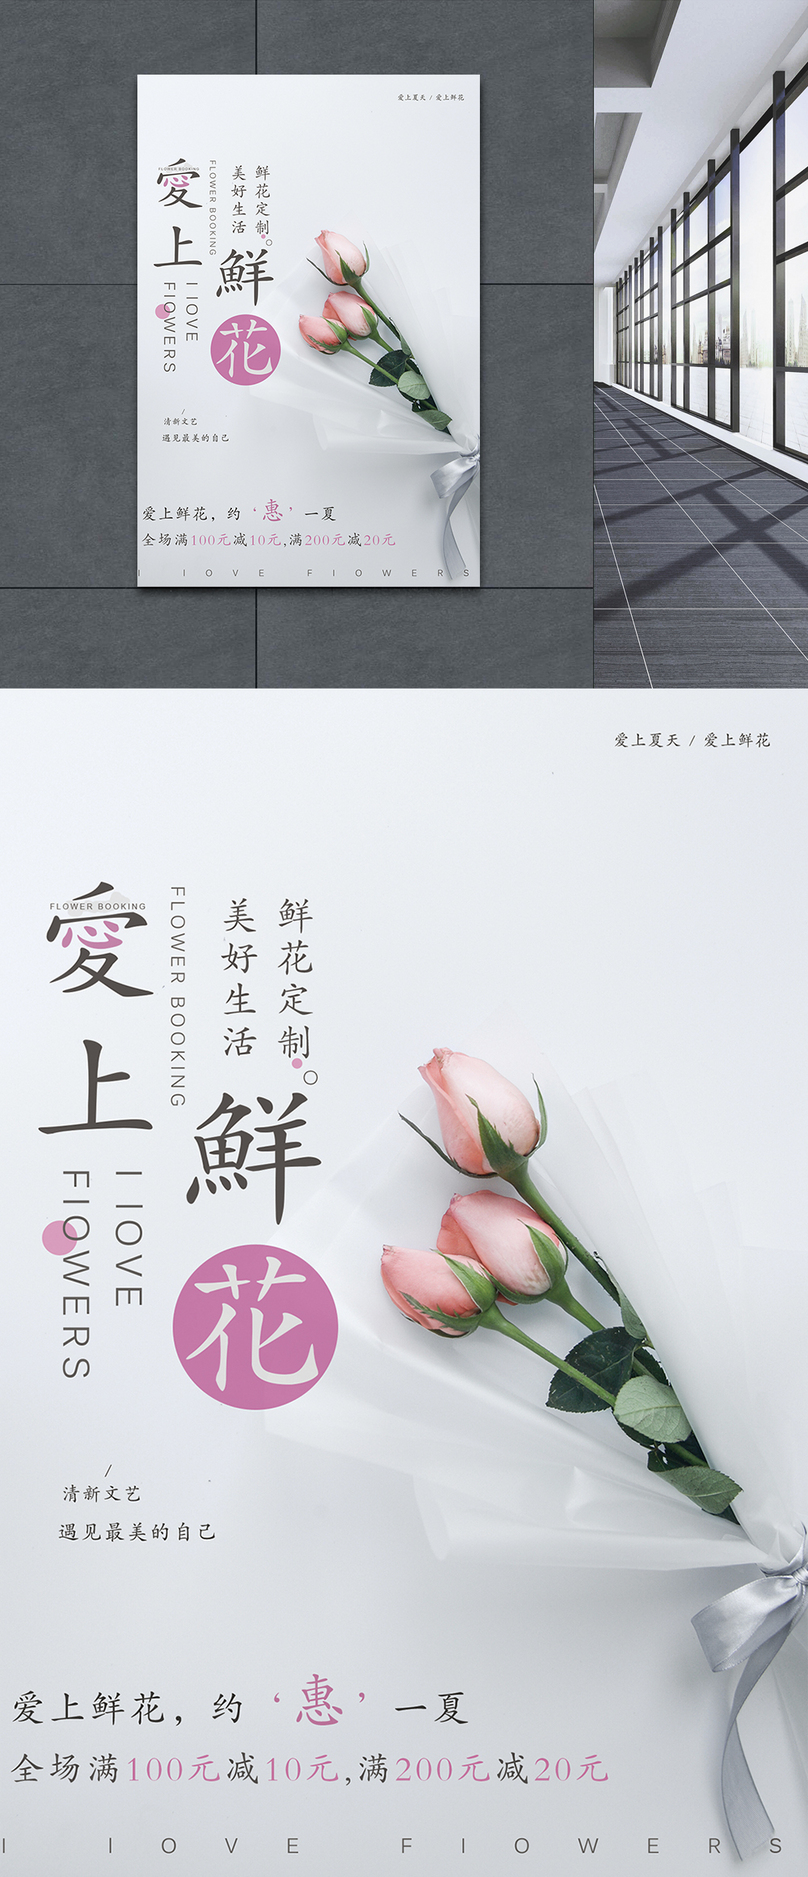 Jatuh Cinta Dengan Promosi Poster Toko Bunga Gambar Unduh Gratis